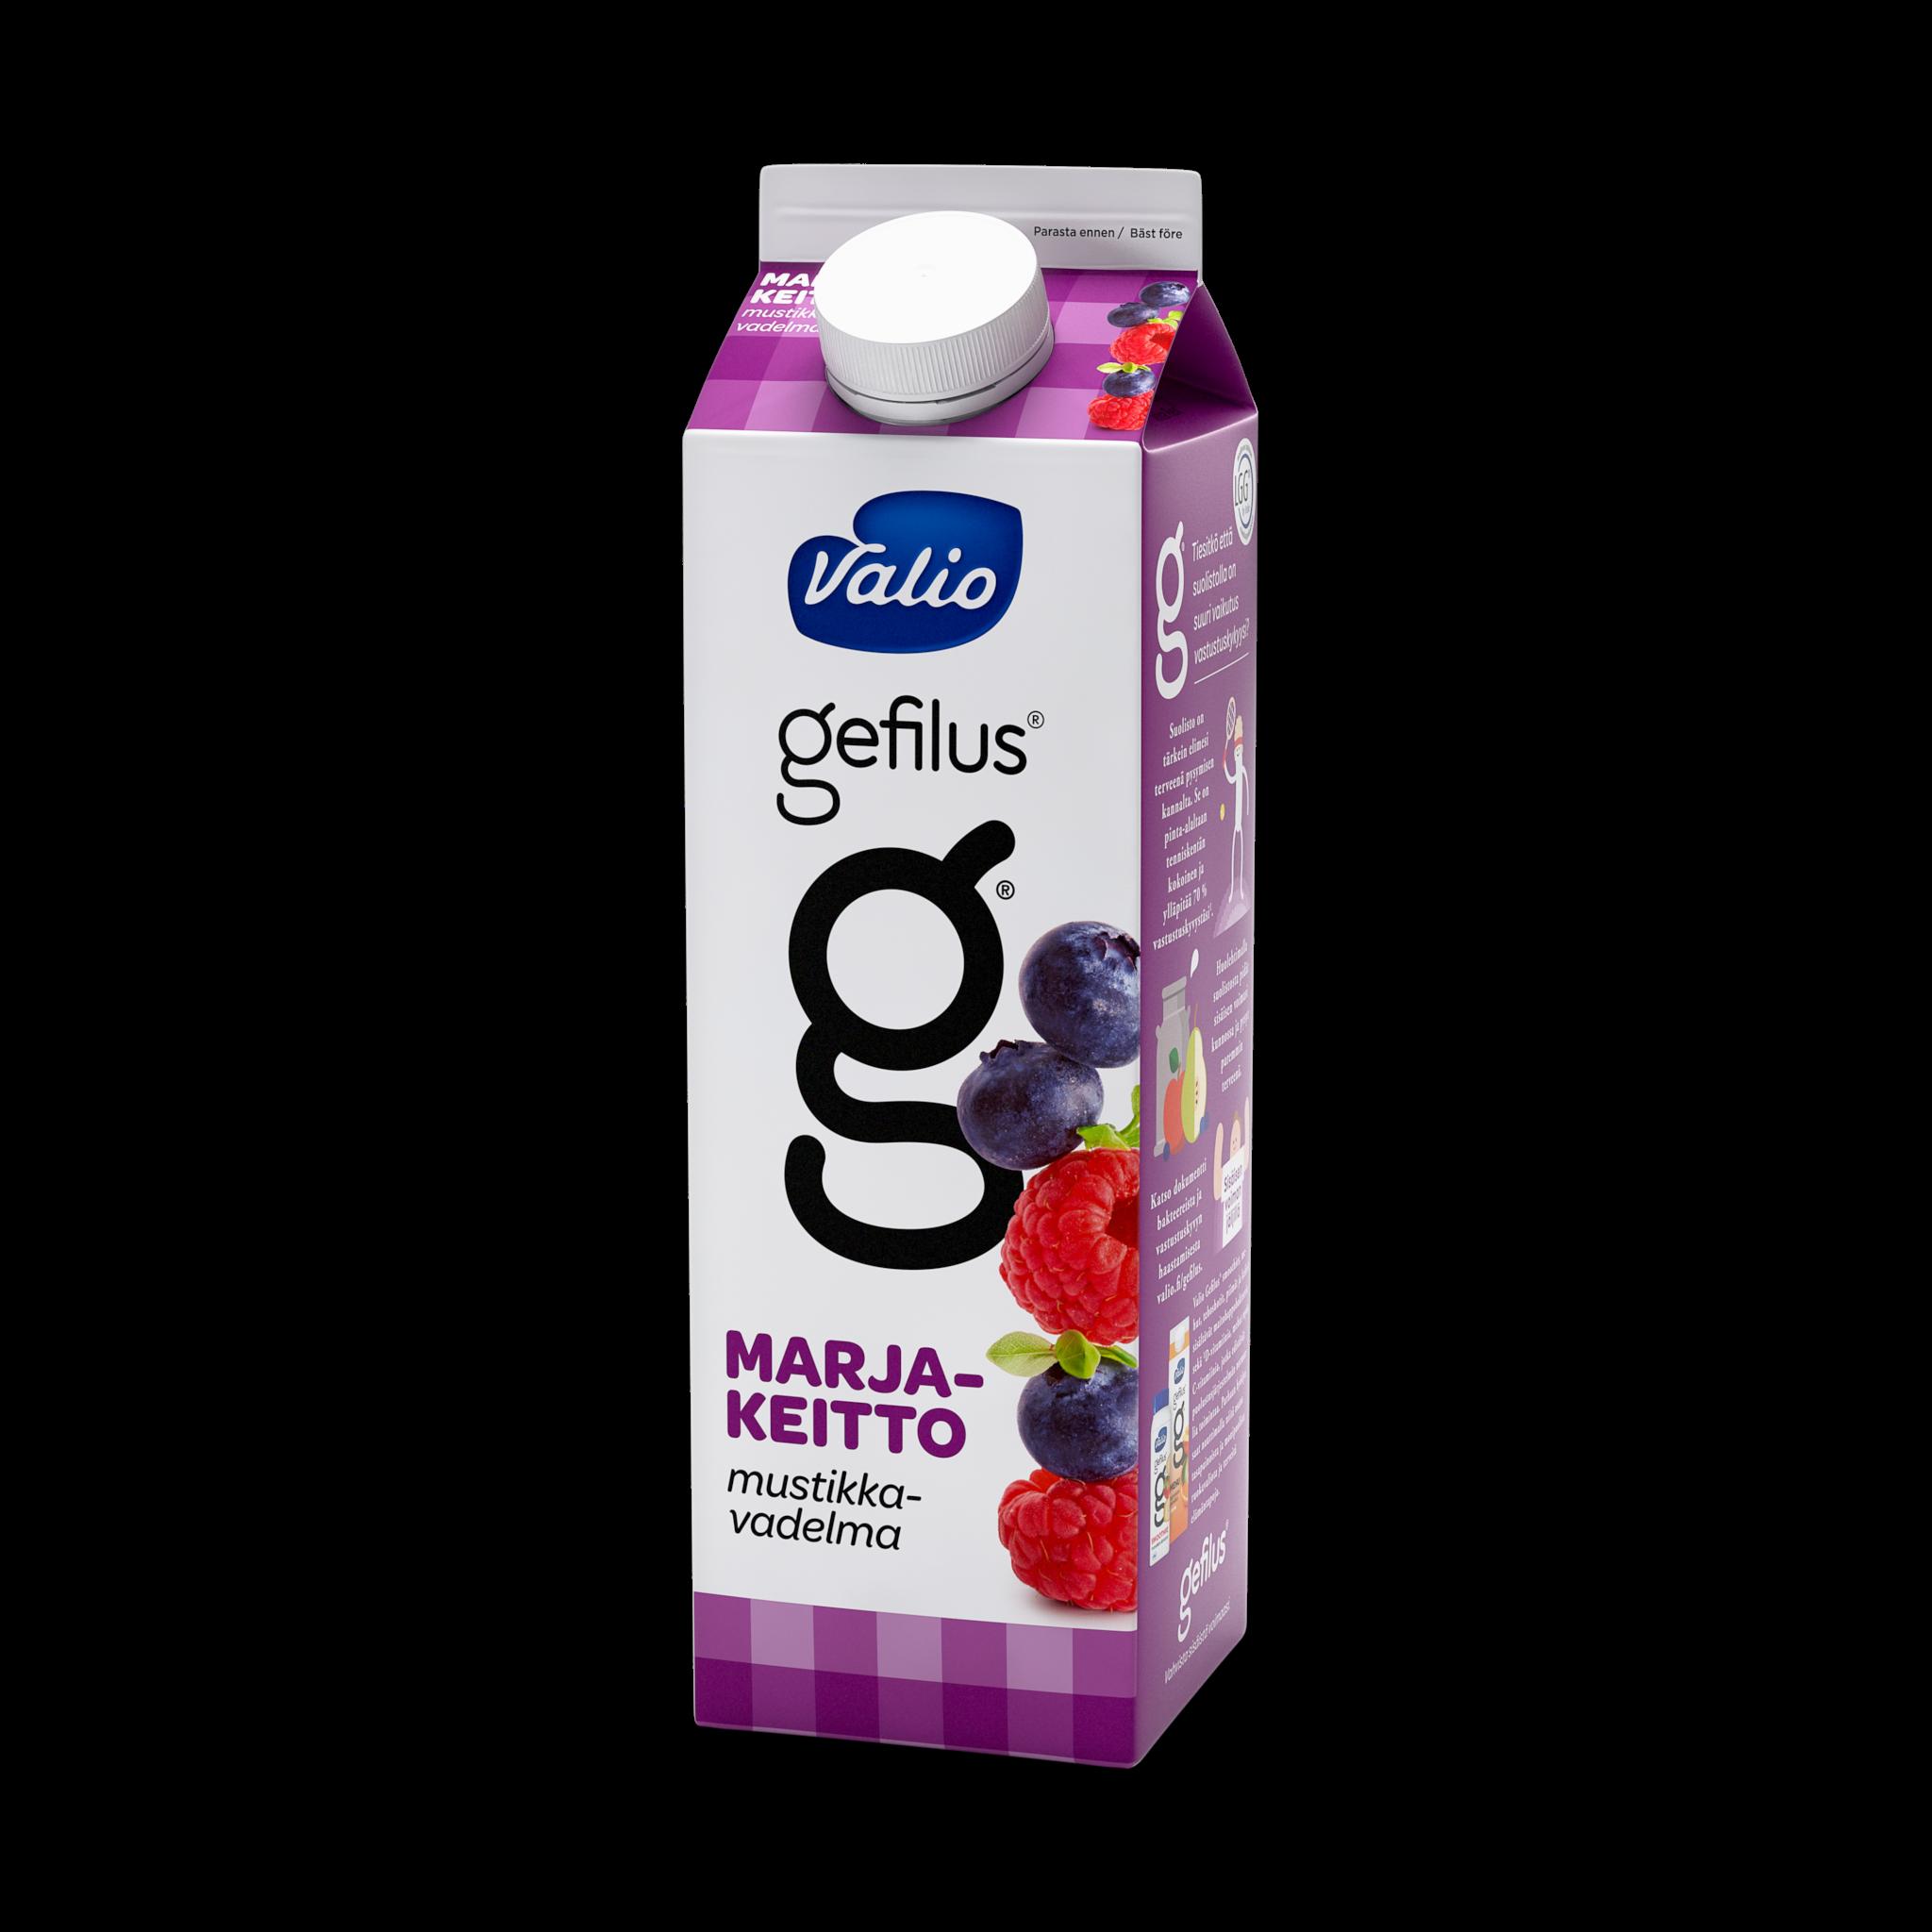 Valio Gefilus® mustikka-vadelmakeitto